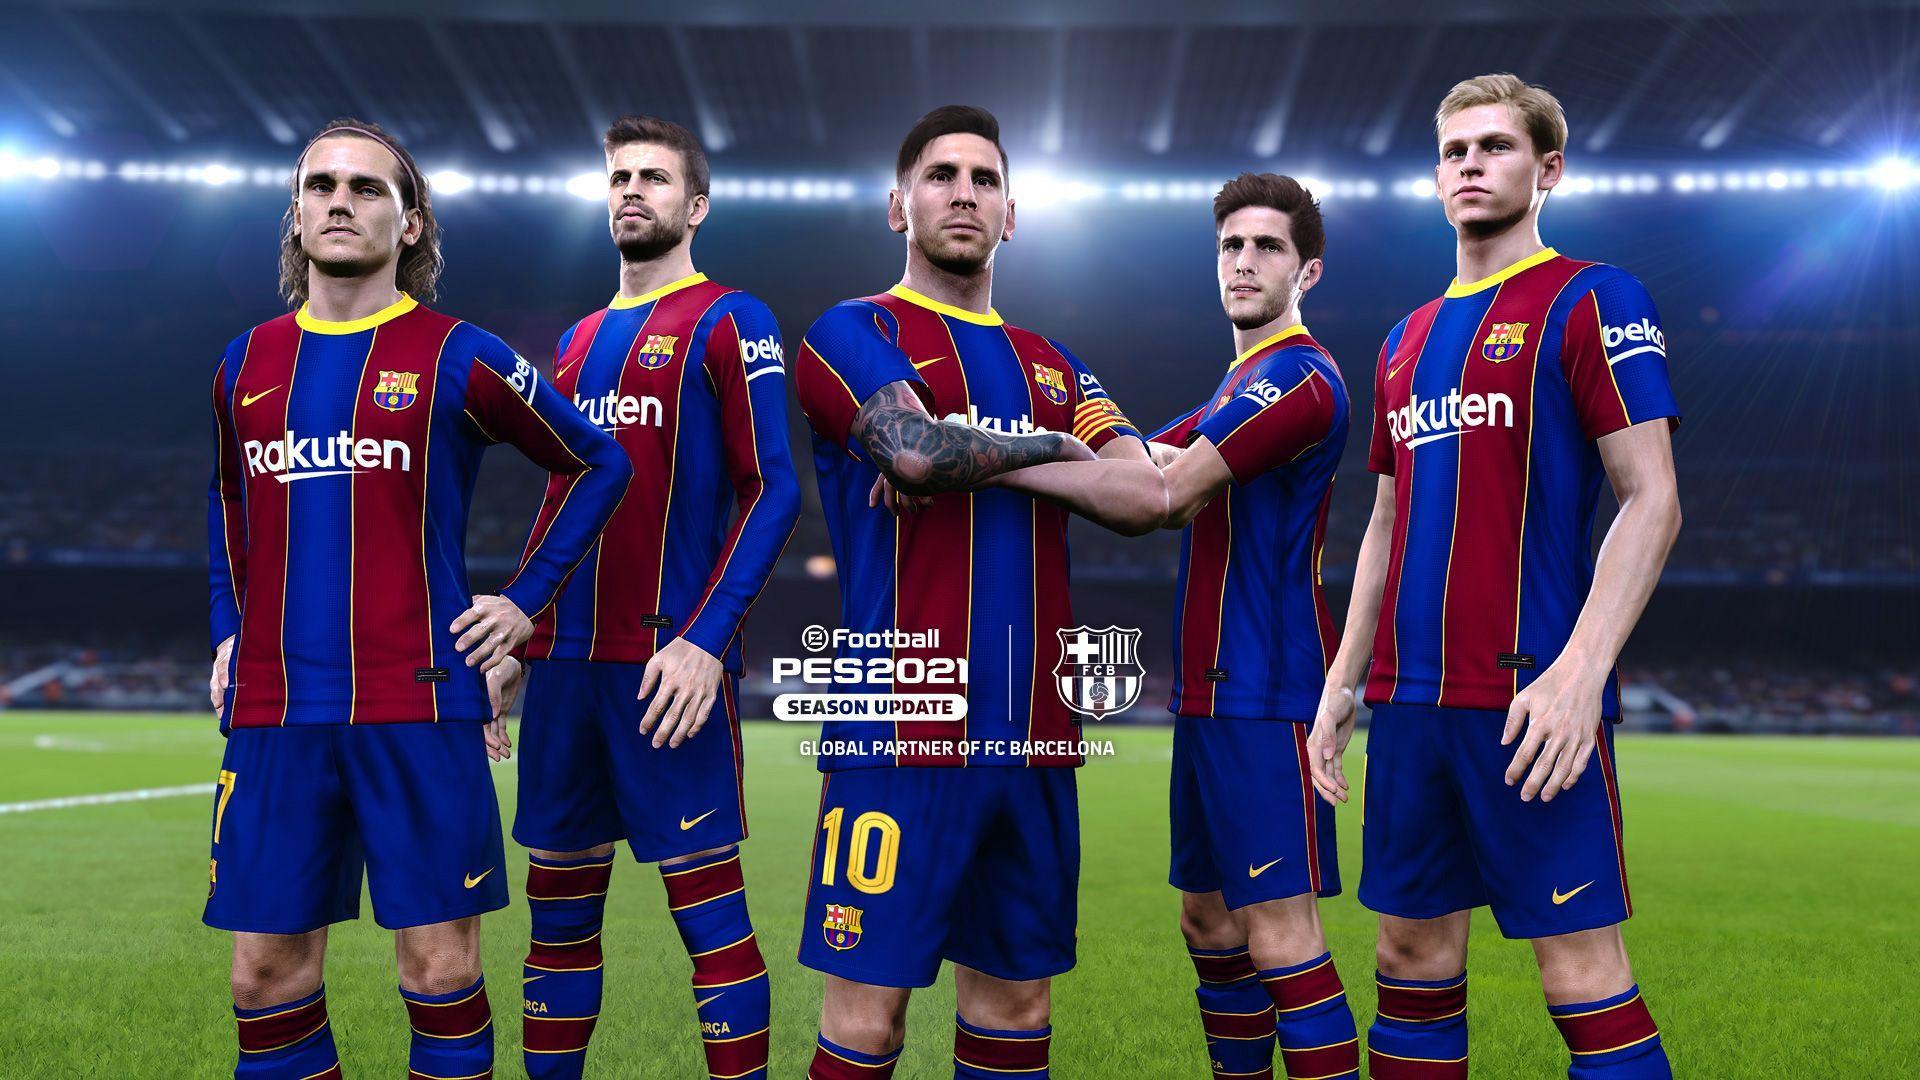 barcelona 2021 wallpapers top free